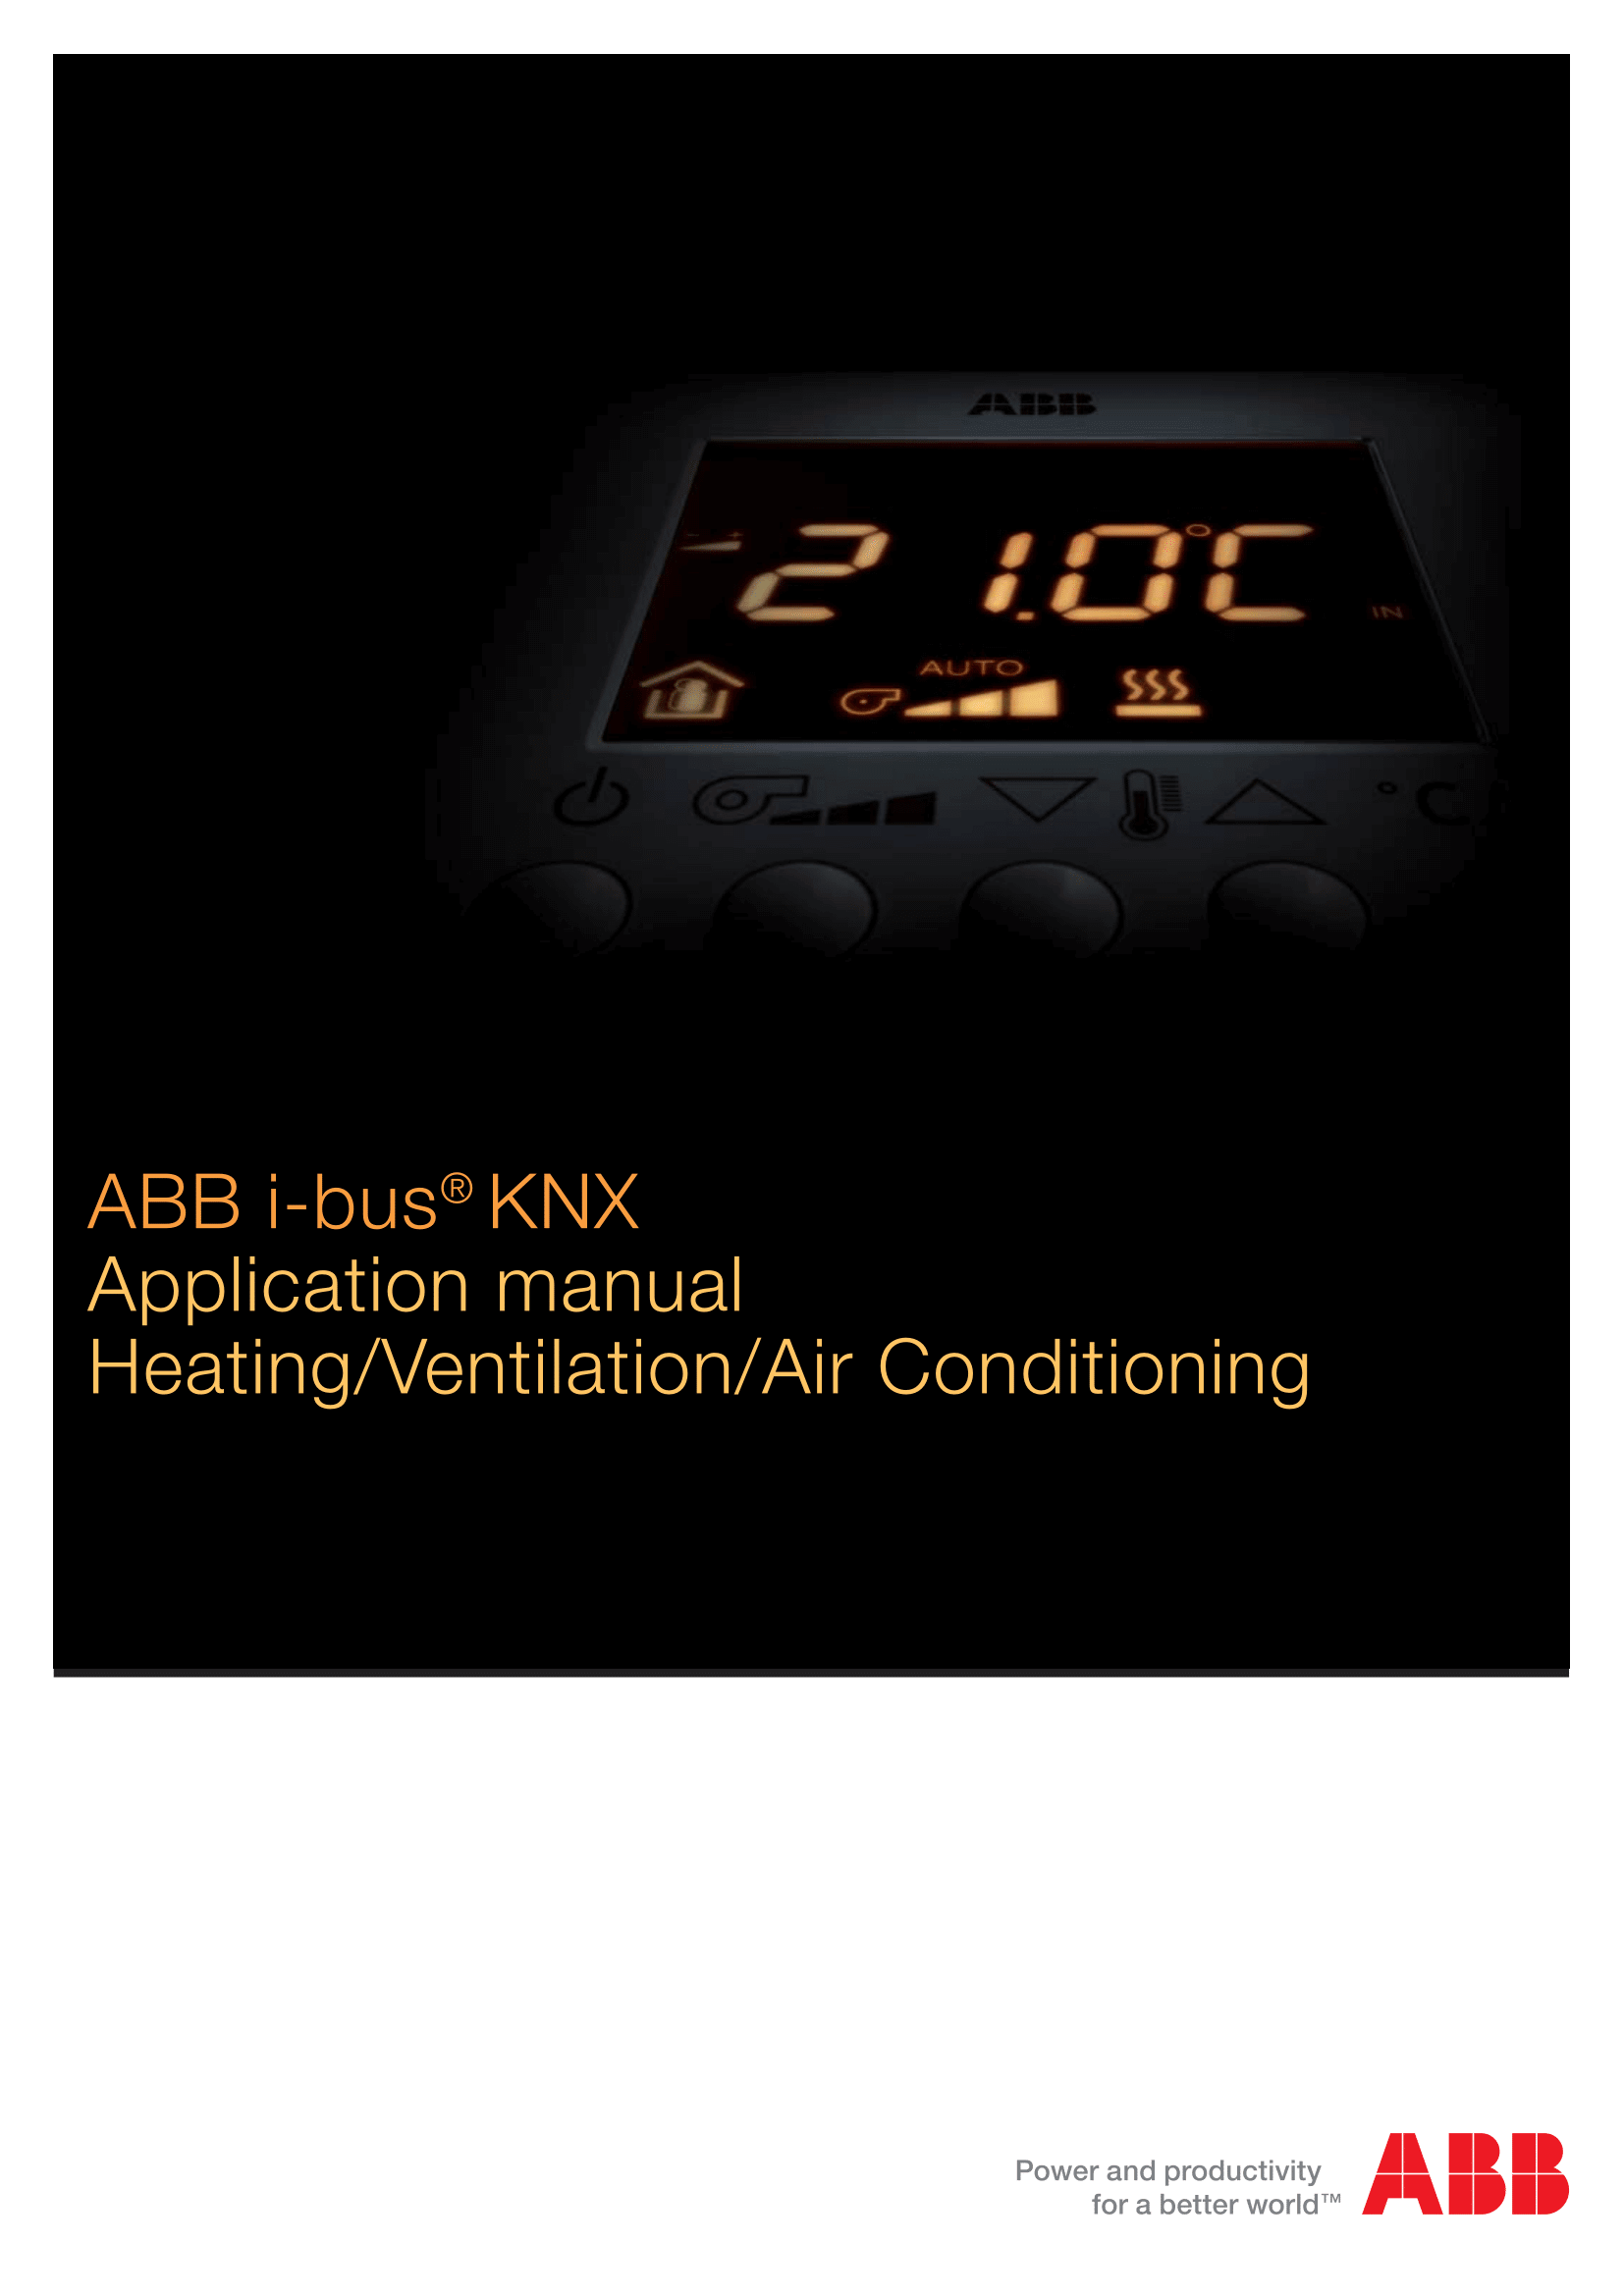 ABB KNX HVAC Control Application Manual